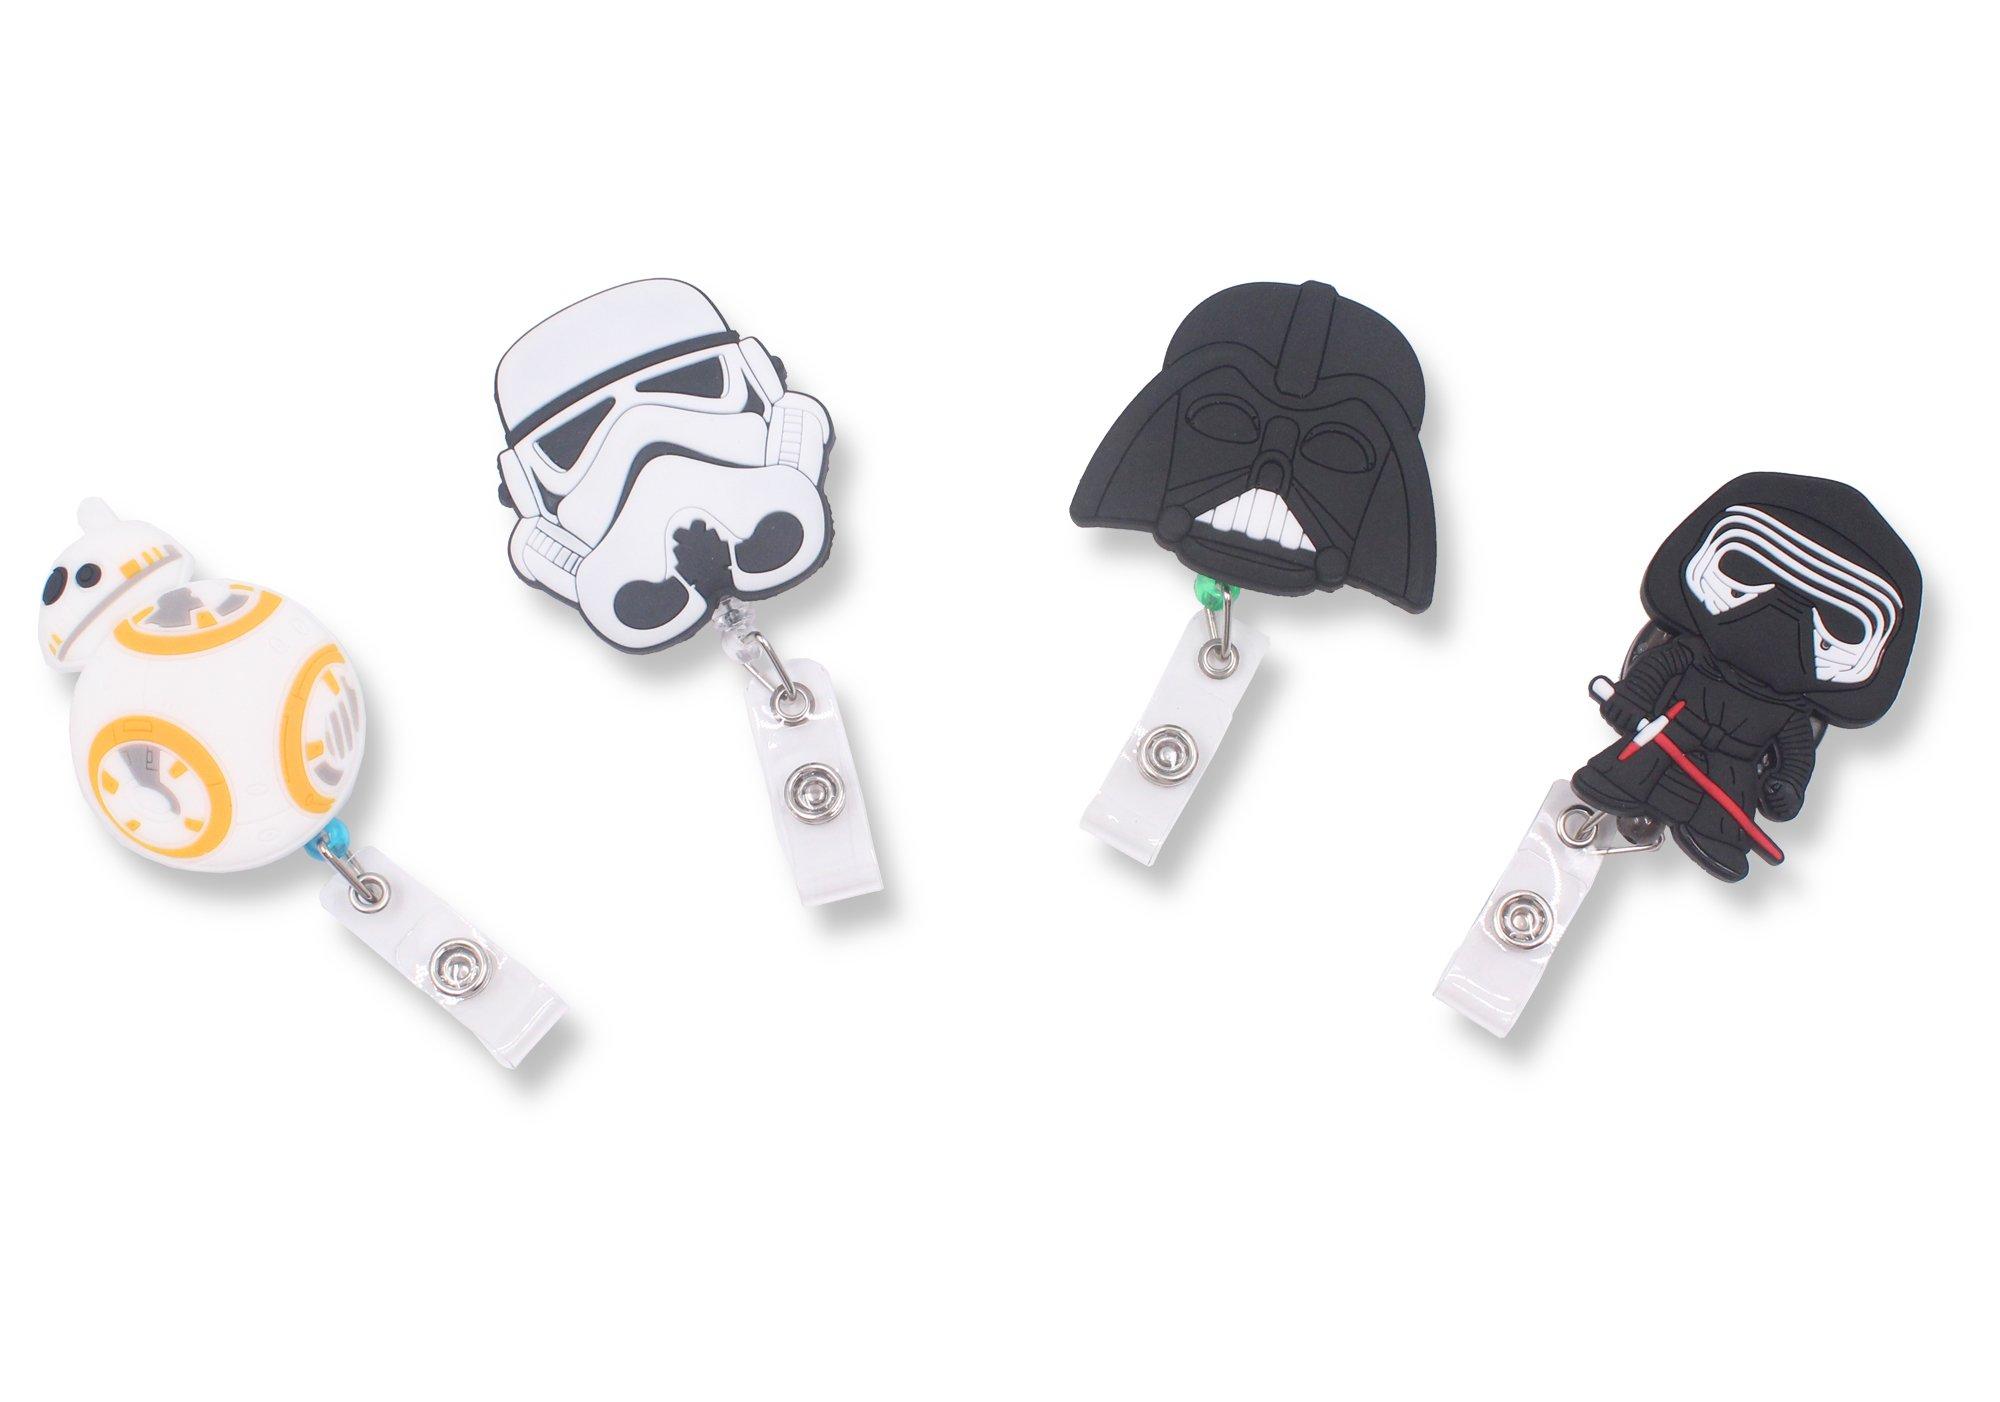 Finex Star Wars BB8 Darth Vader Kylo Ren Stormtrooper Set of 4 Retractable Badge Holder ID Badge Reel Clip On Card Holders